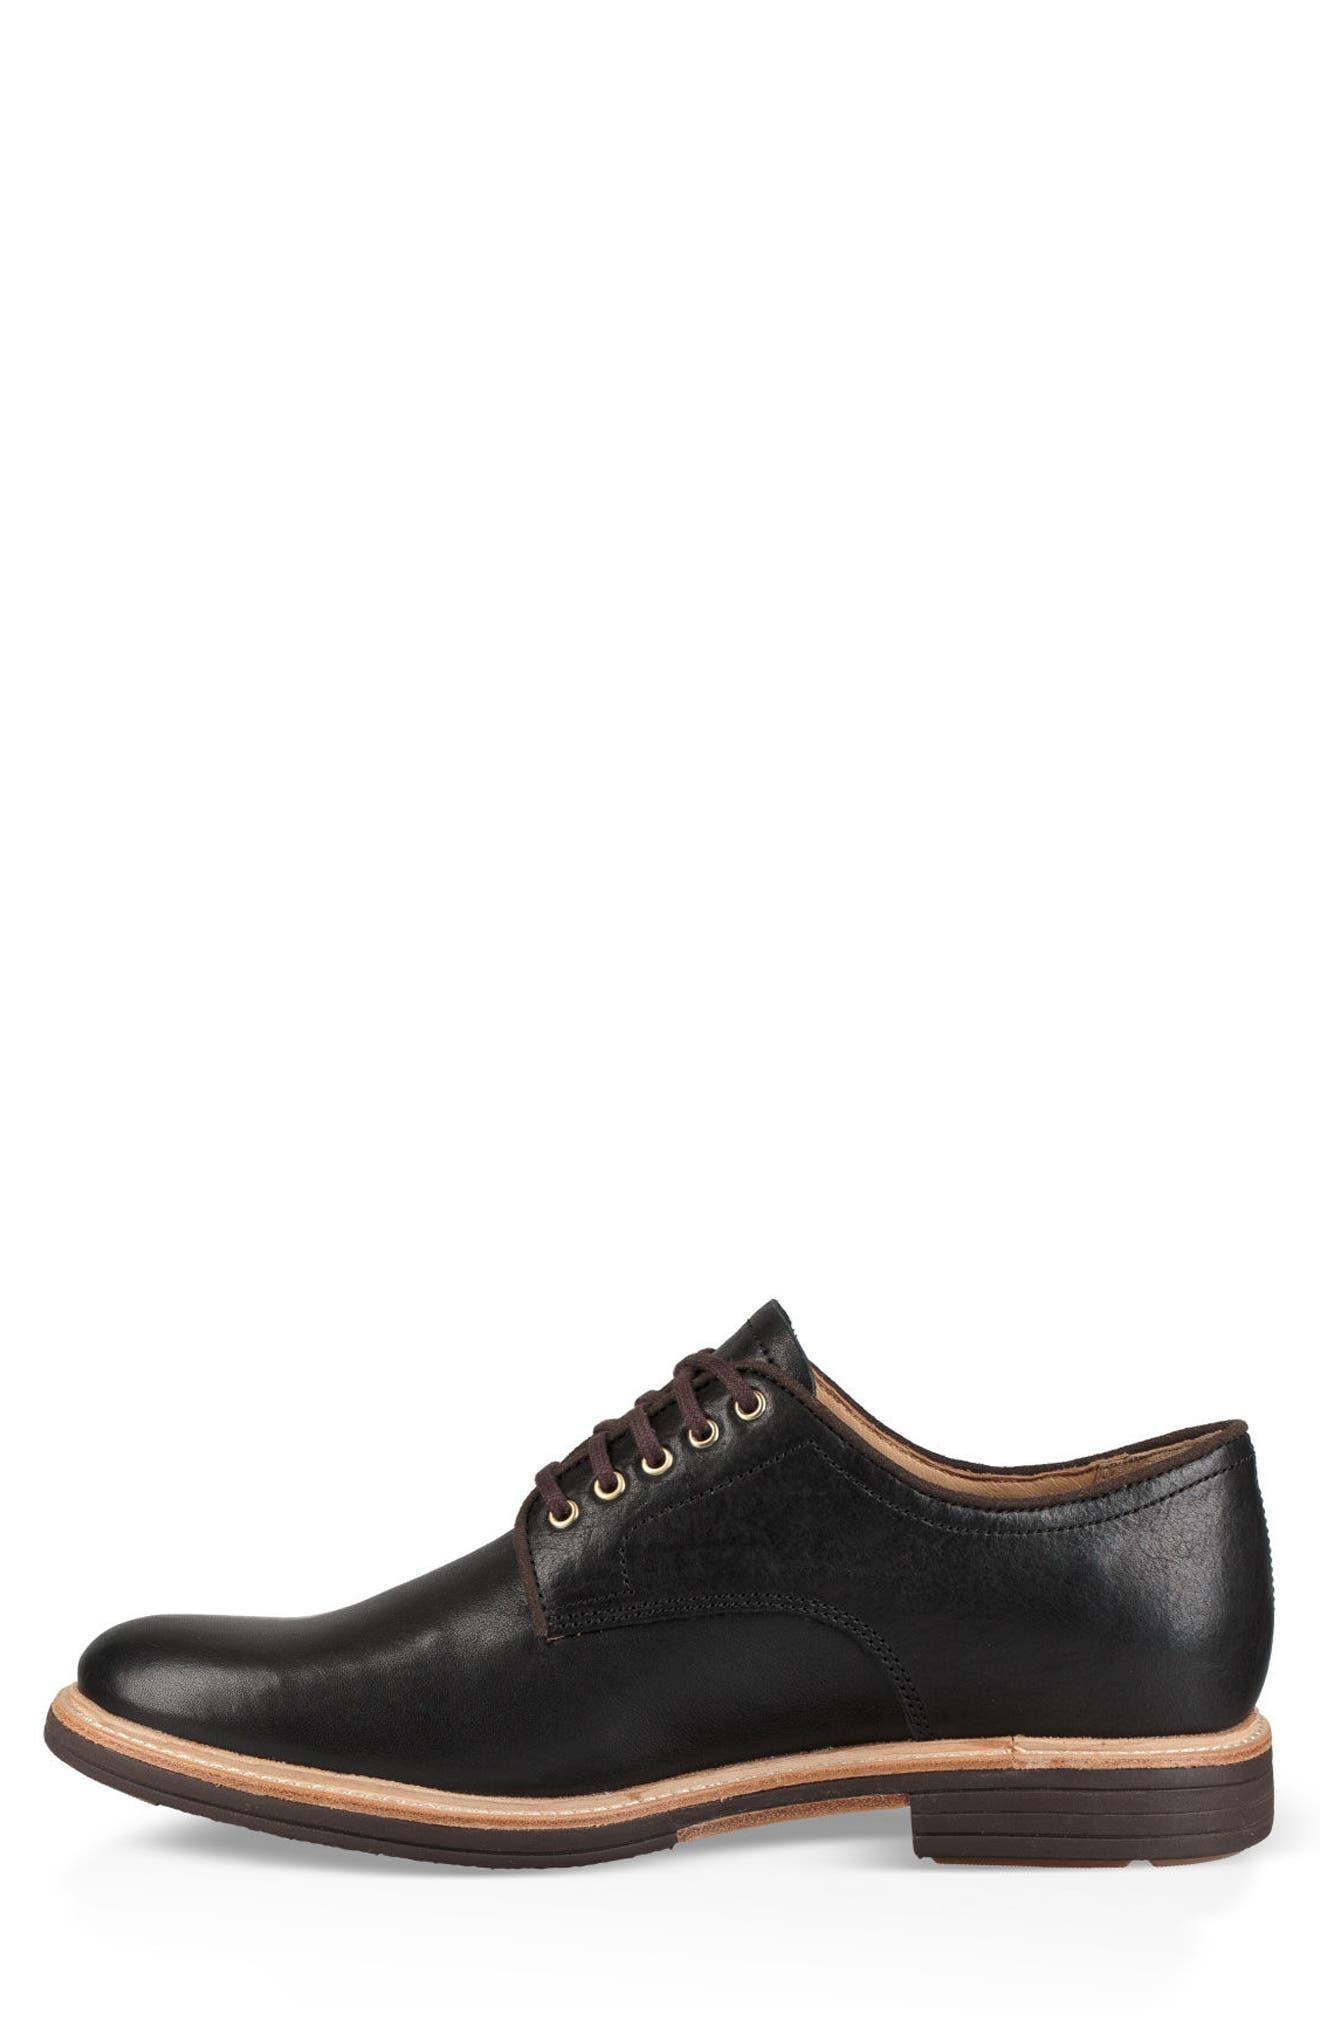 Jovin Buck Shoe,                             Alternate thumbnail 3, color,                             BLACK LEATHER/SUEDE